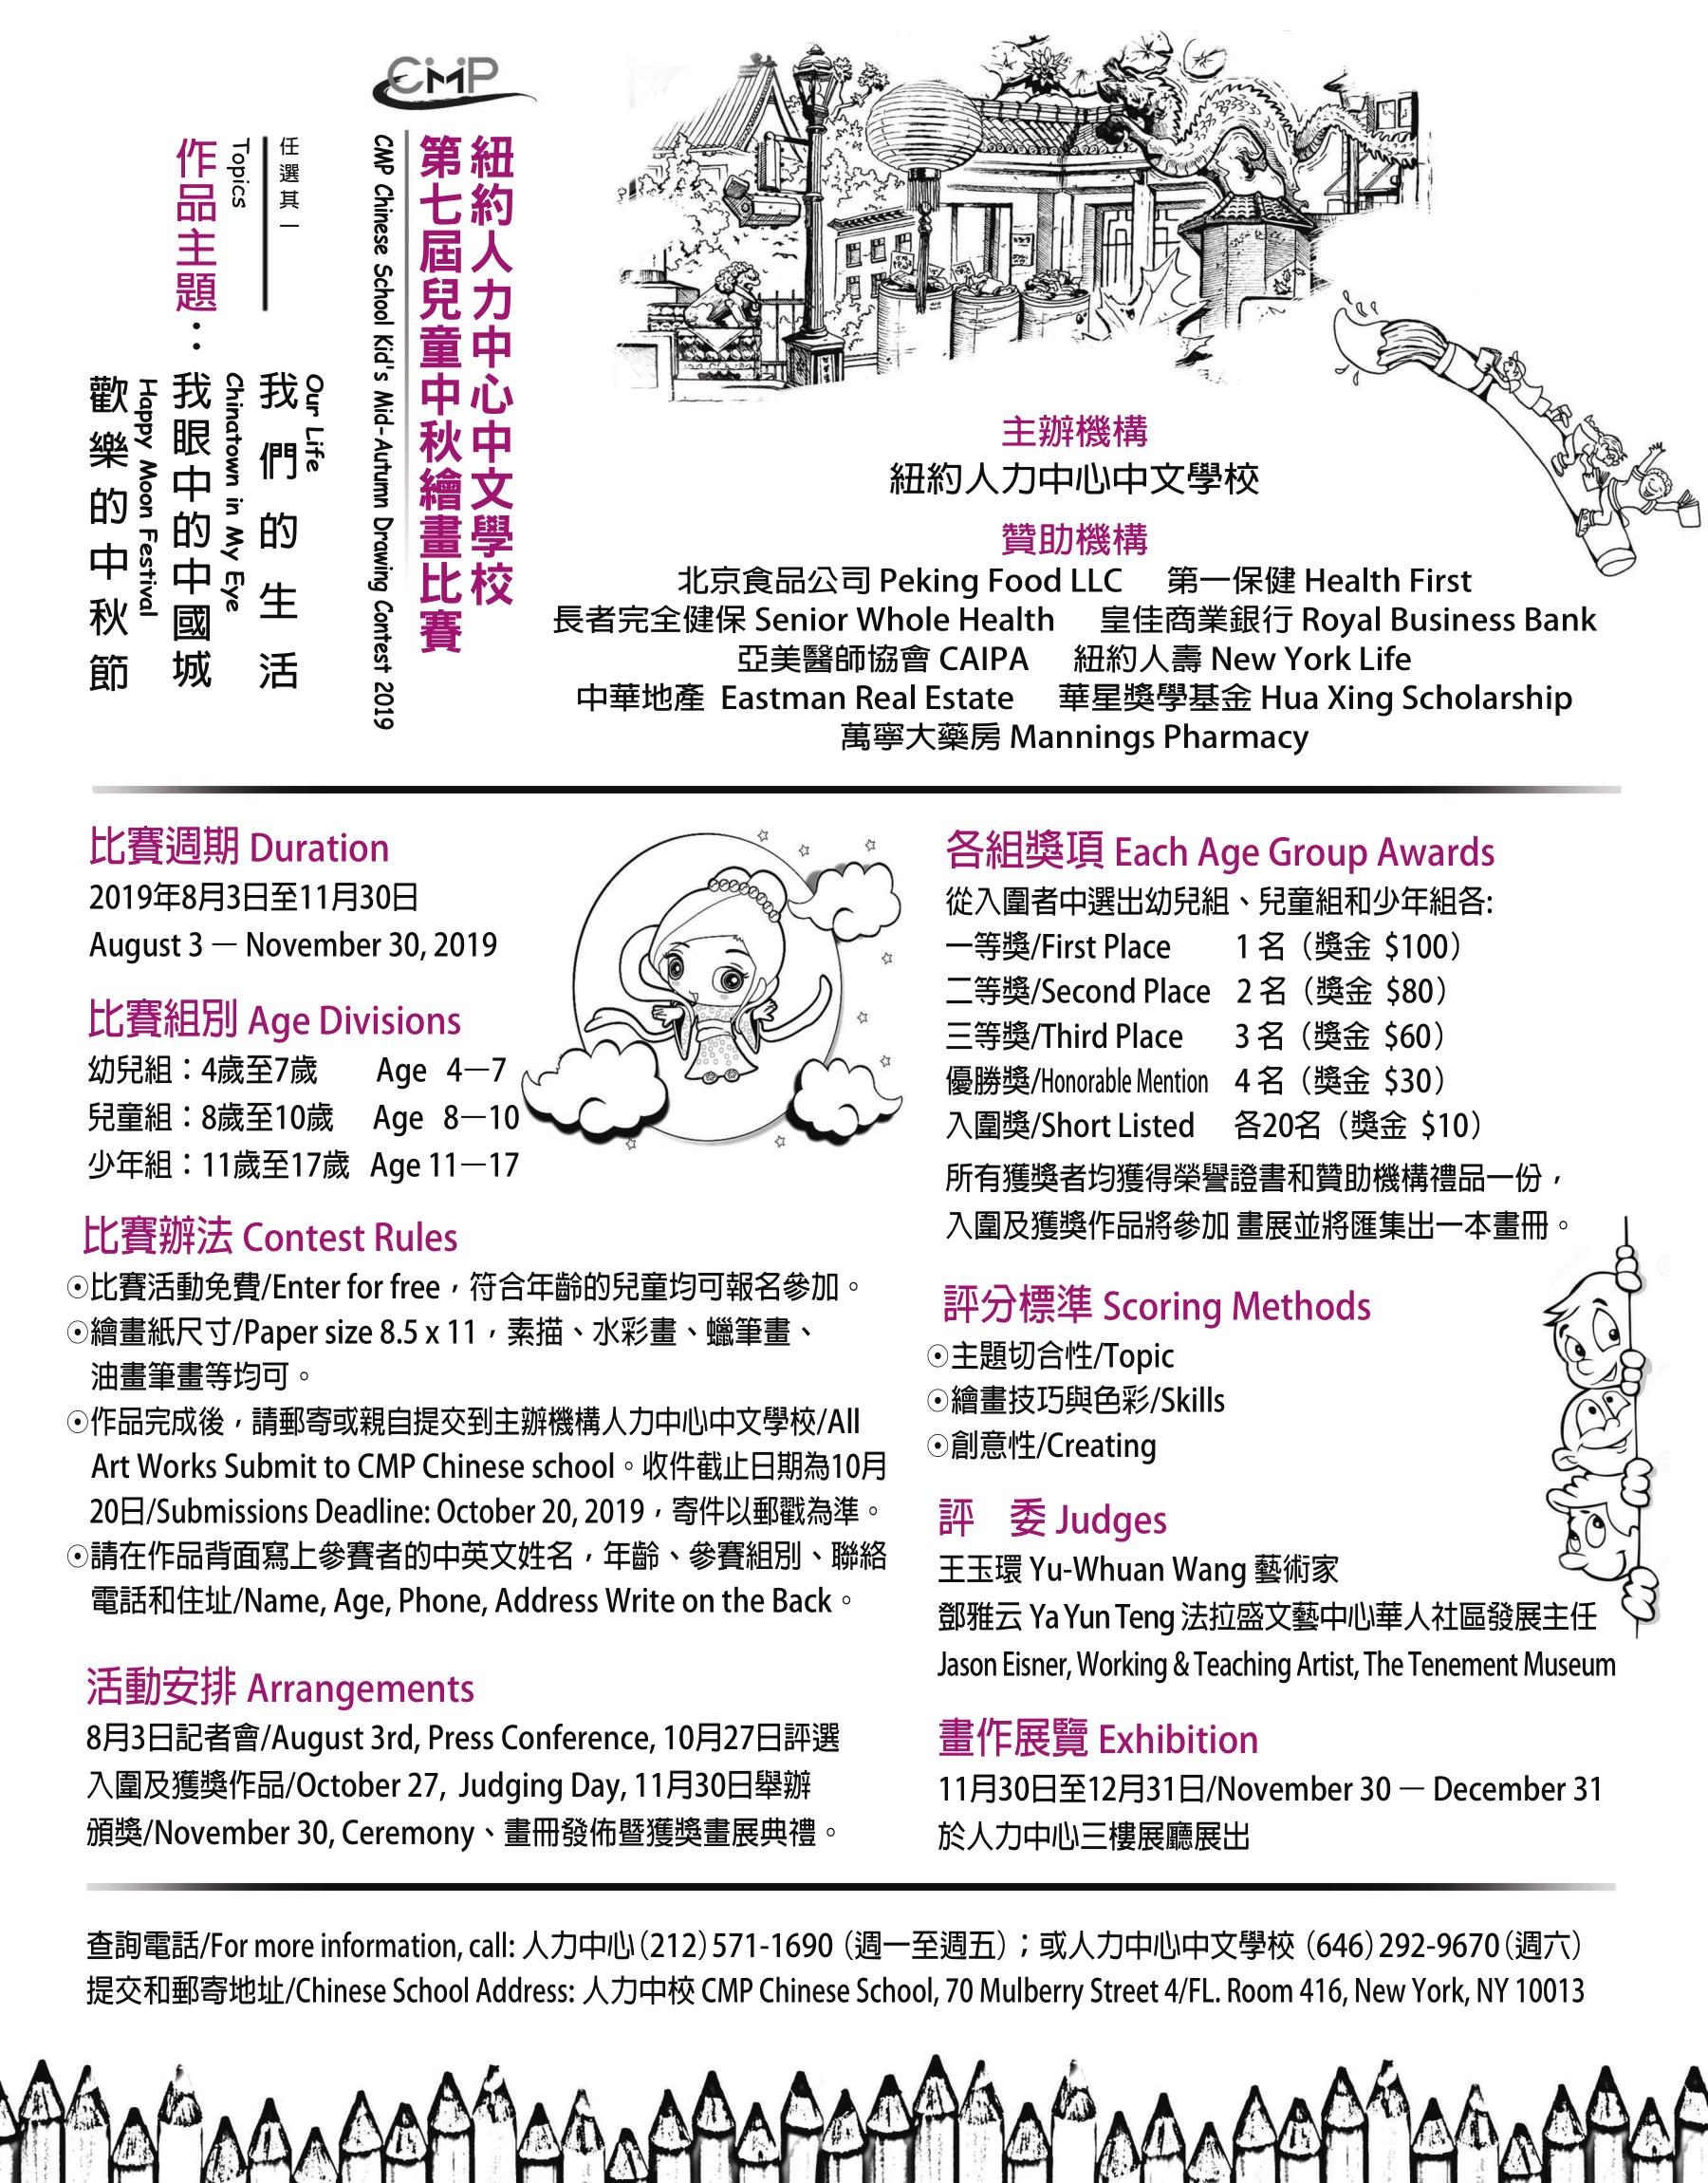 Flyer - 第七屆兒童中秋繪畫比賽徵集畫作 Kid's Mid-Autumn Drawing Contest 2019 Final-1.png